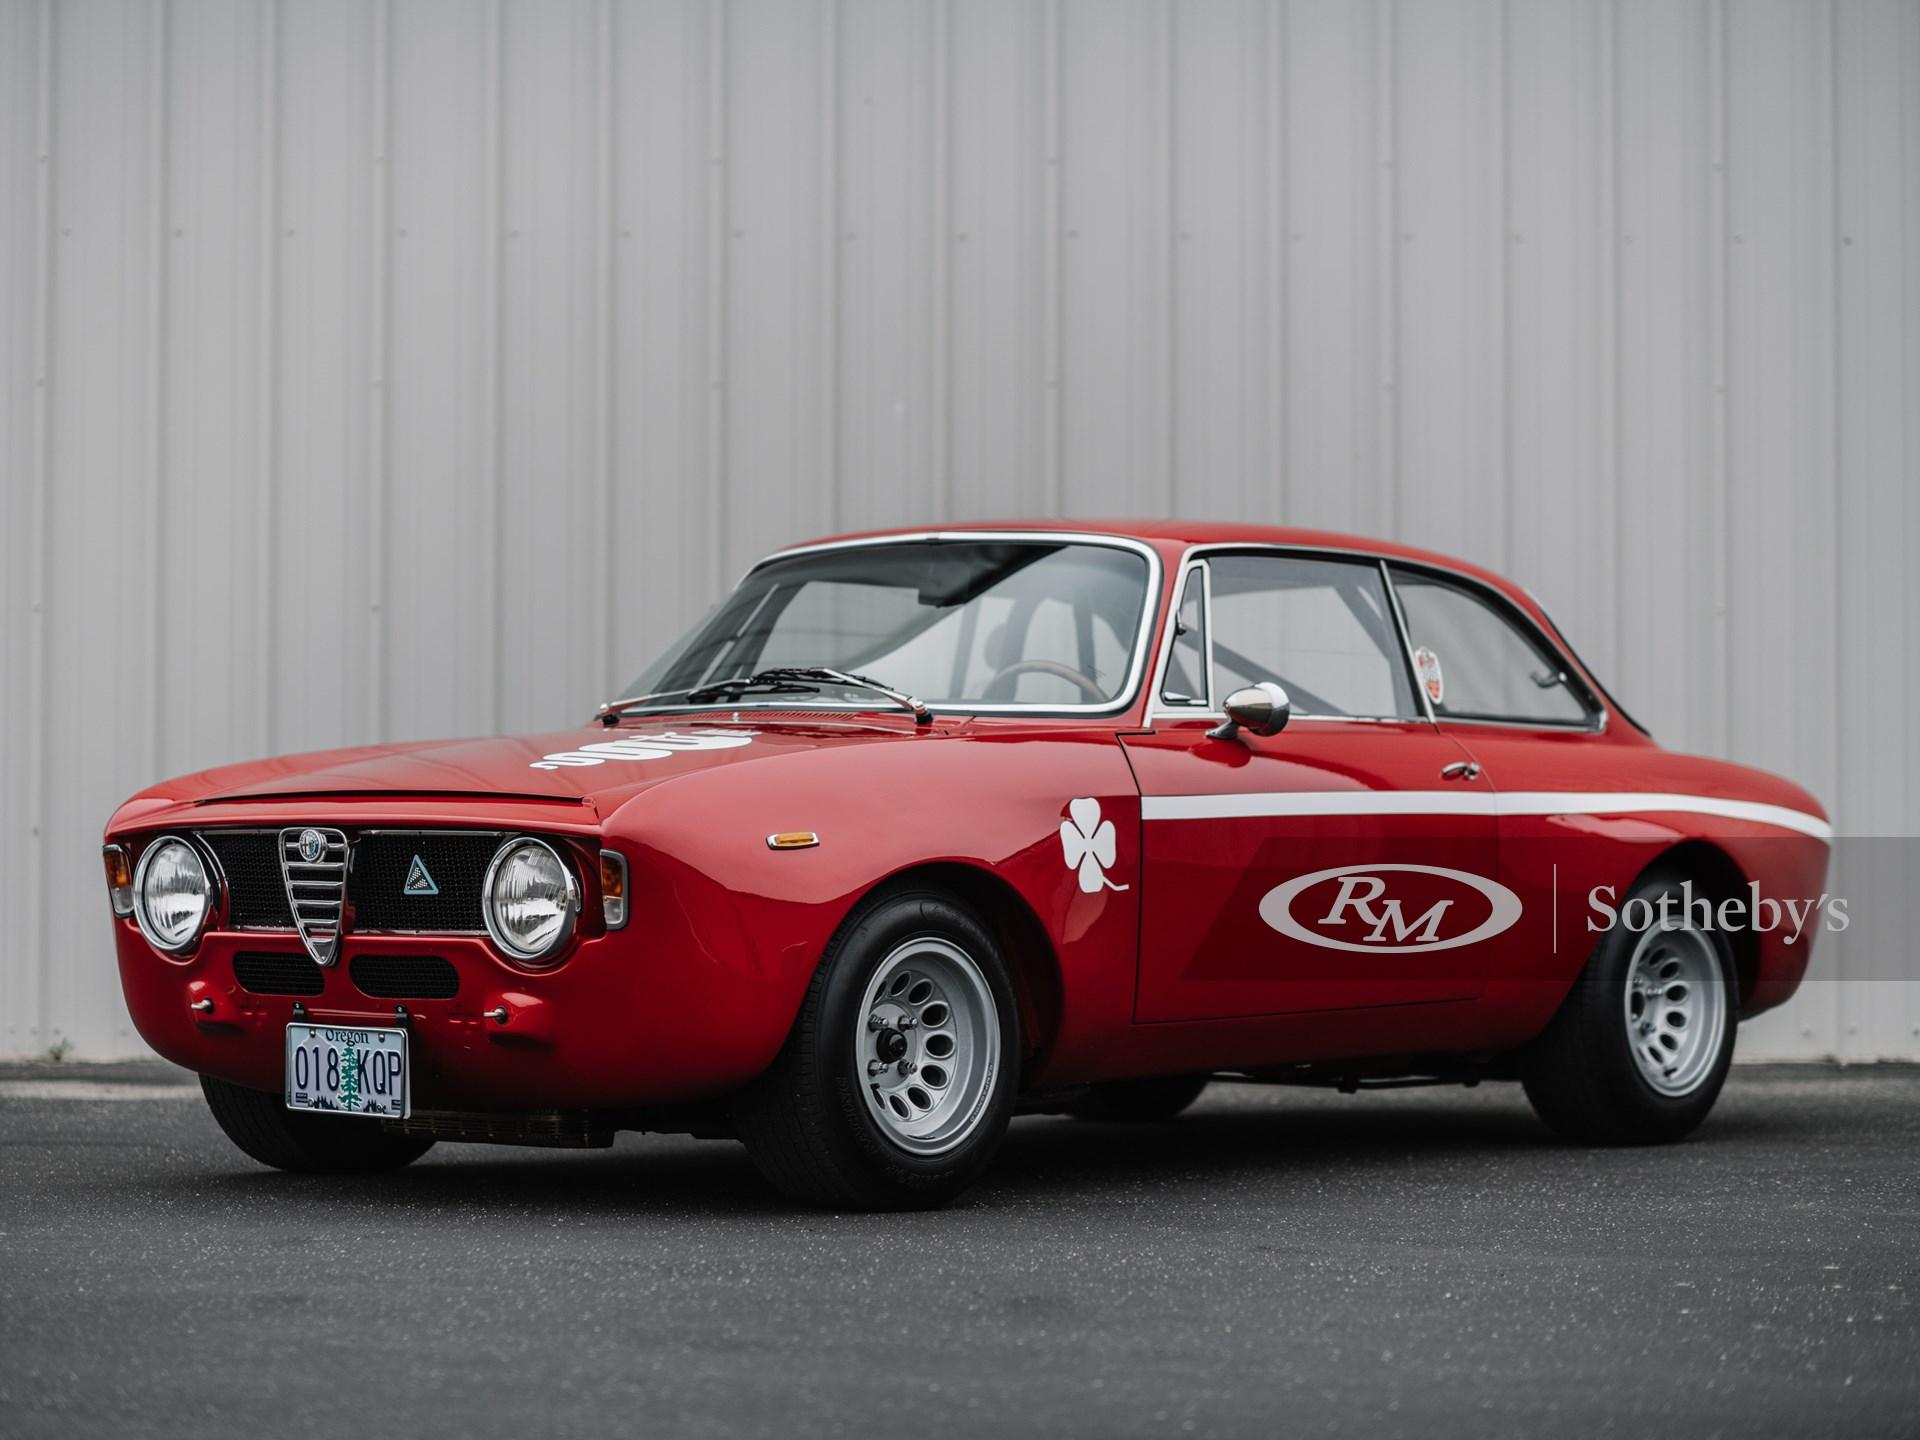 1969 Alfa Romeo Giulia Gta 1300 Junior By Bertone Shift Monterey Rm Online Only